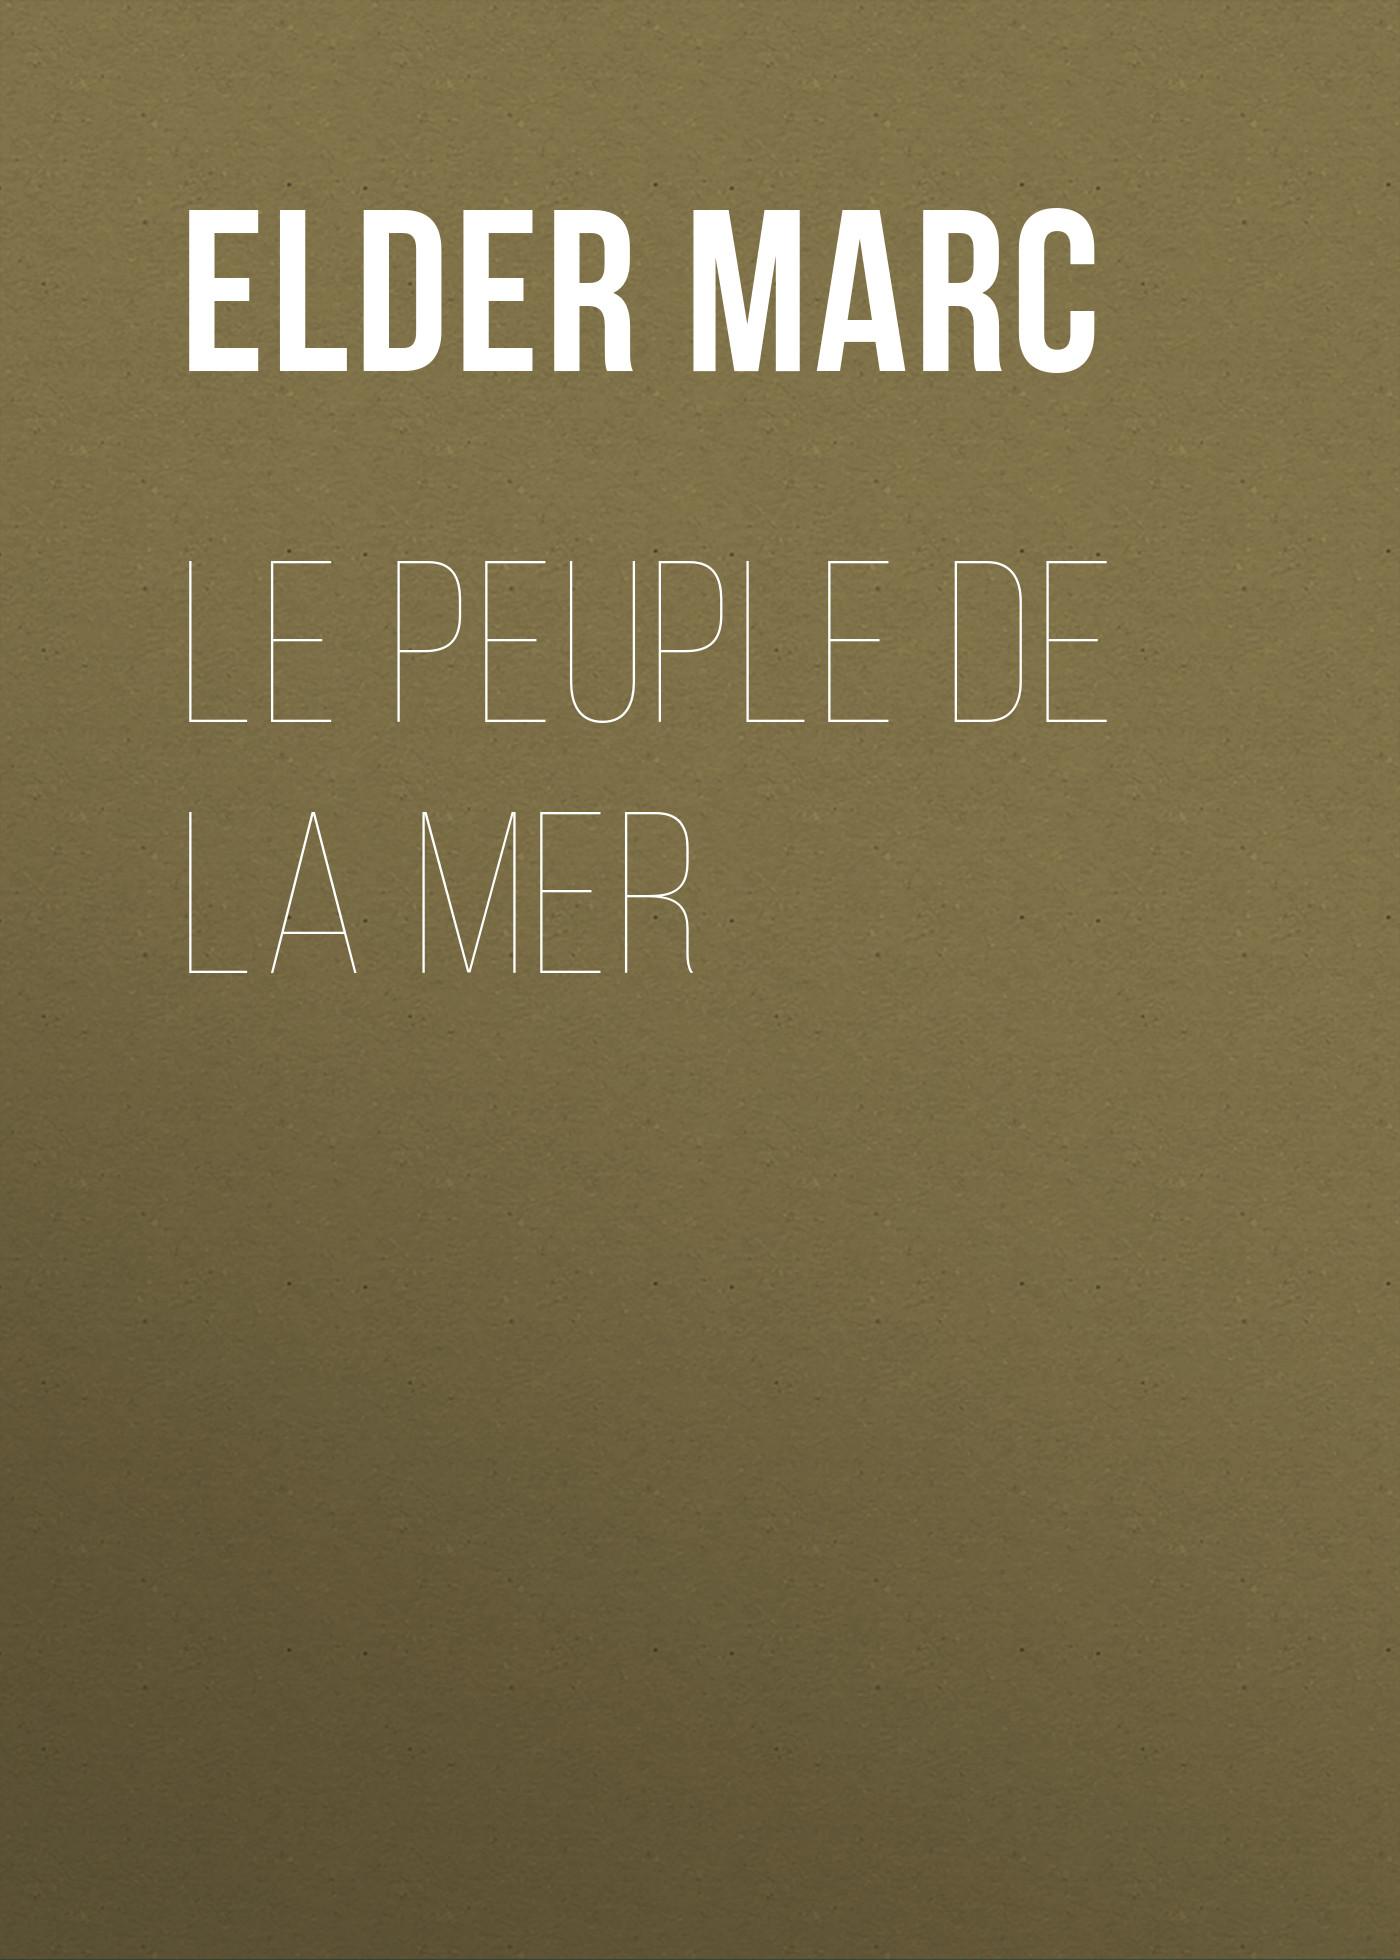 Elder Marc Le Peuple de la mer la mer часы la mer lmmulticw1018a коллекция с цепочками и подвесками